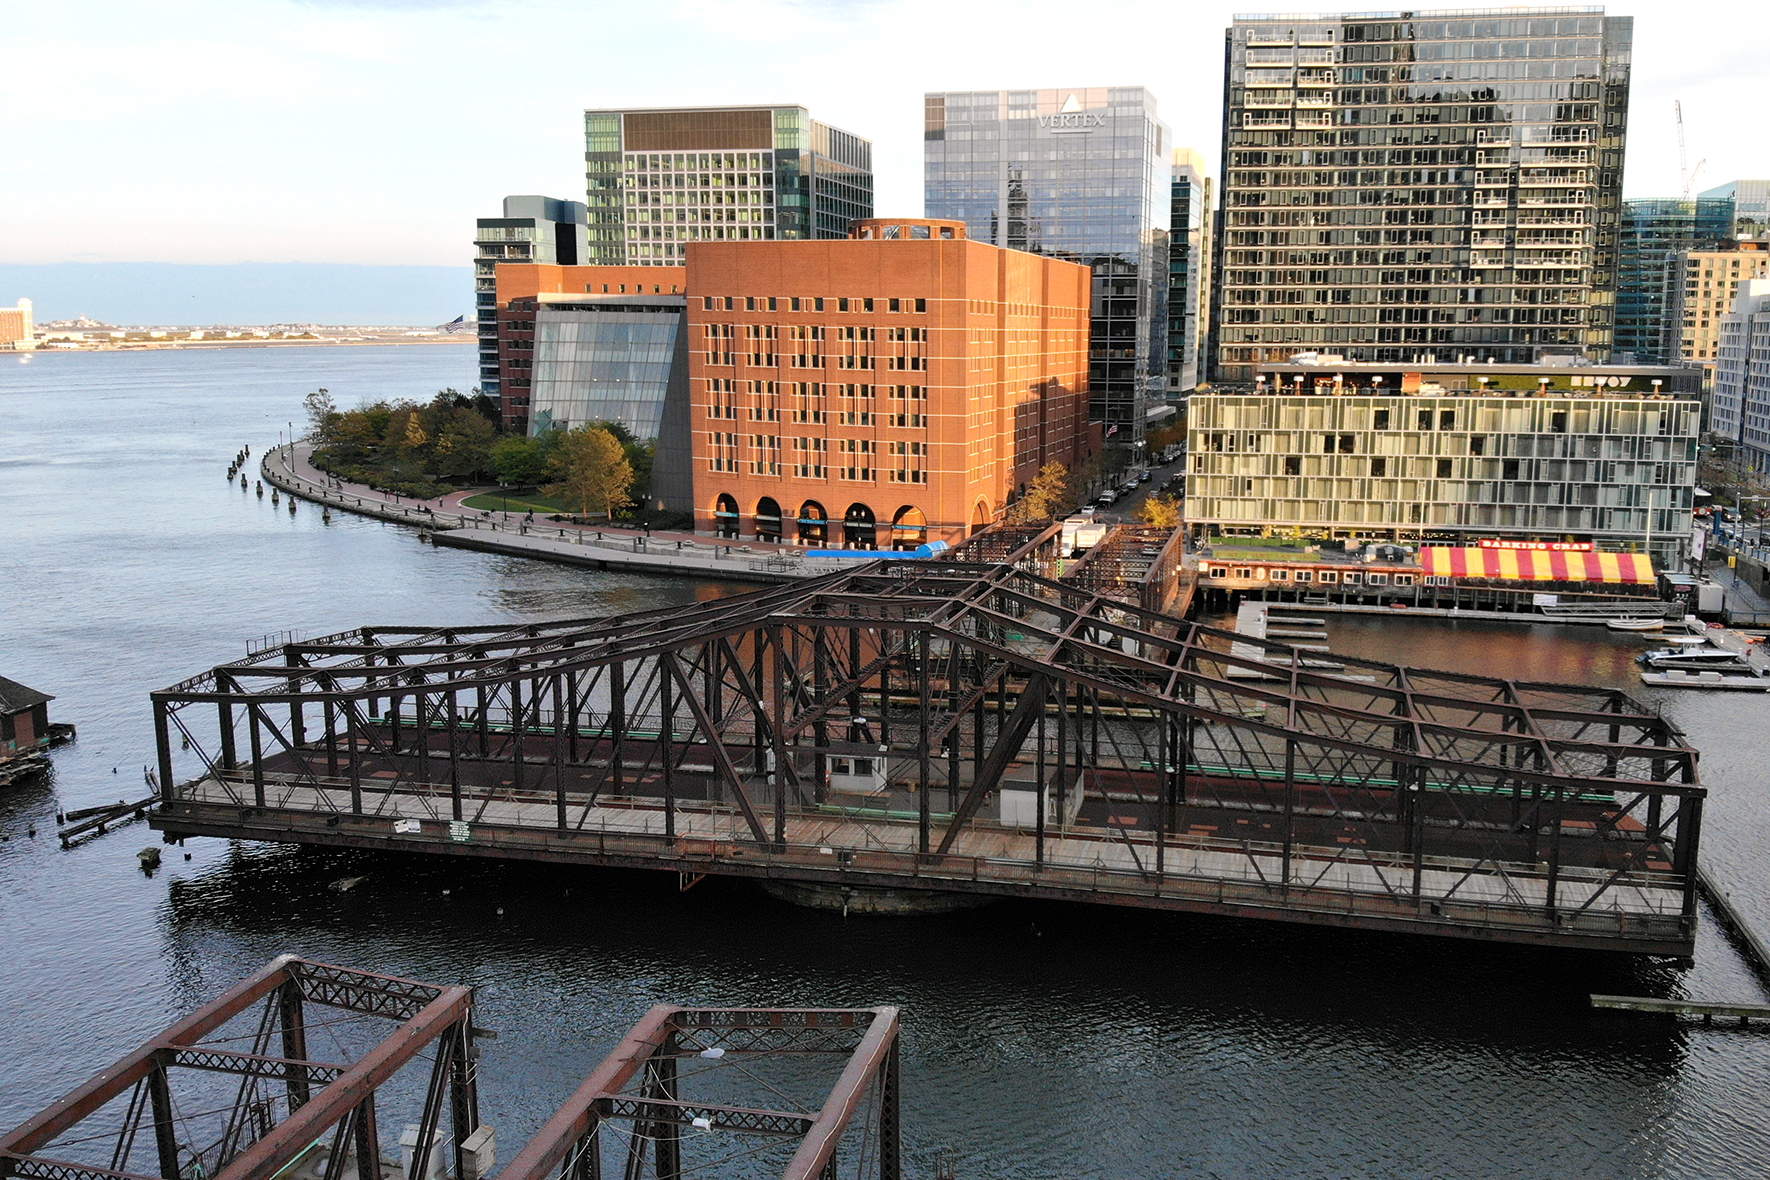 Northern Avenue Bridge Replacement